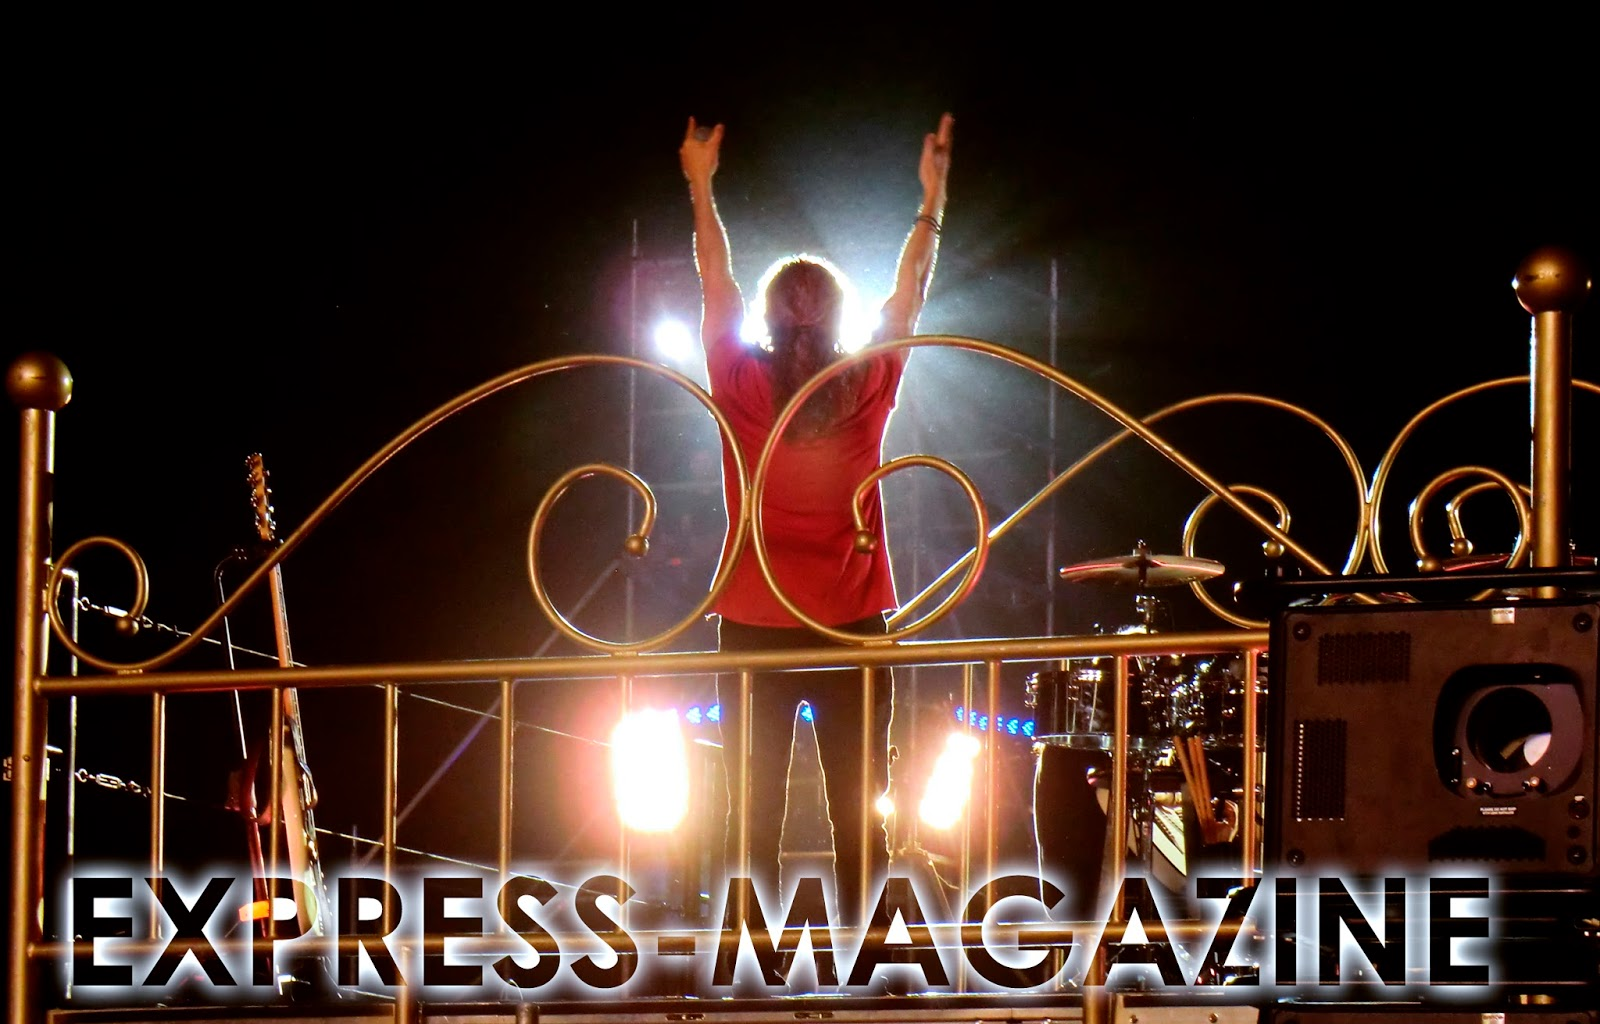 EXPRESS MAGAZINE MARINA BAIXA NOTICIAS: agosto 2015